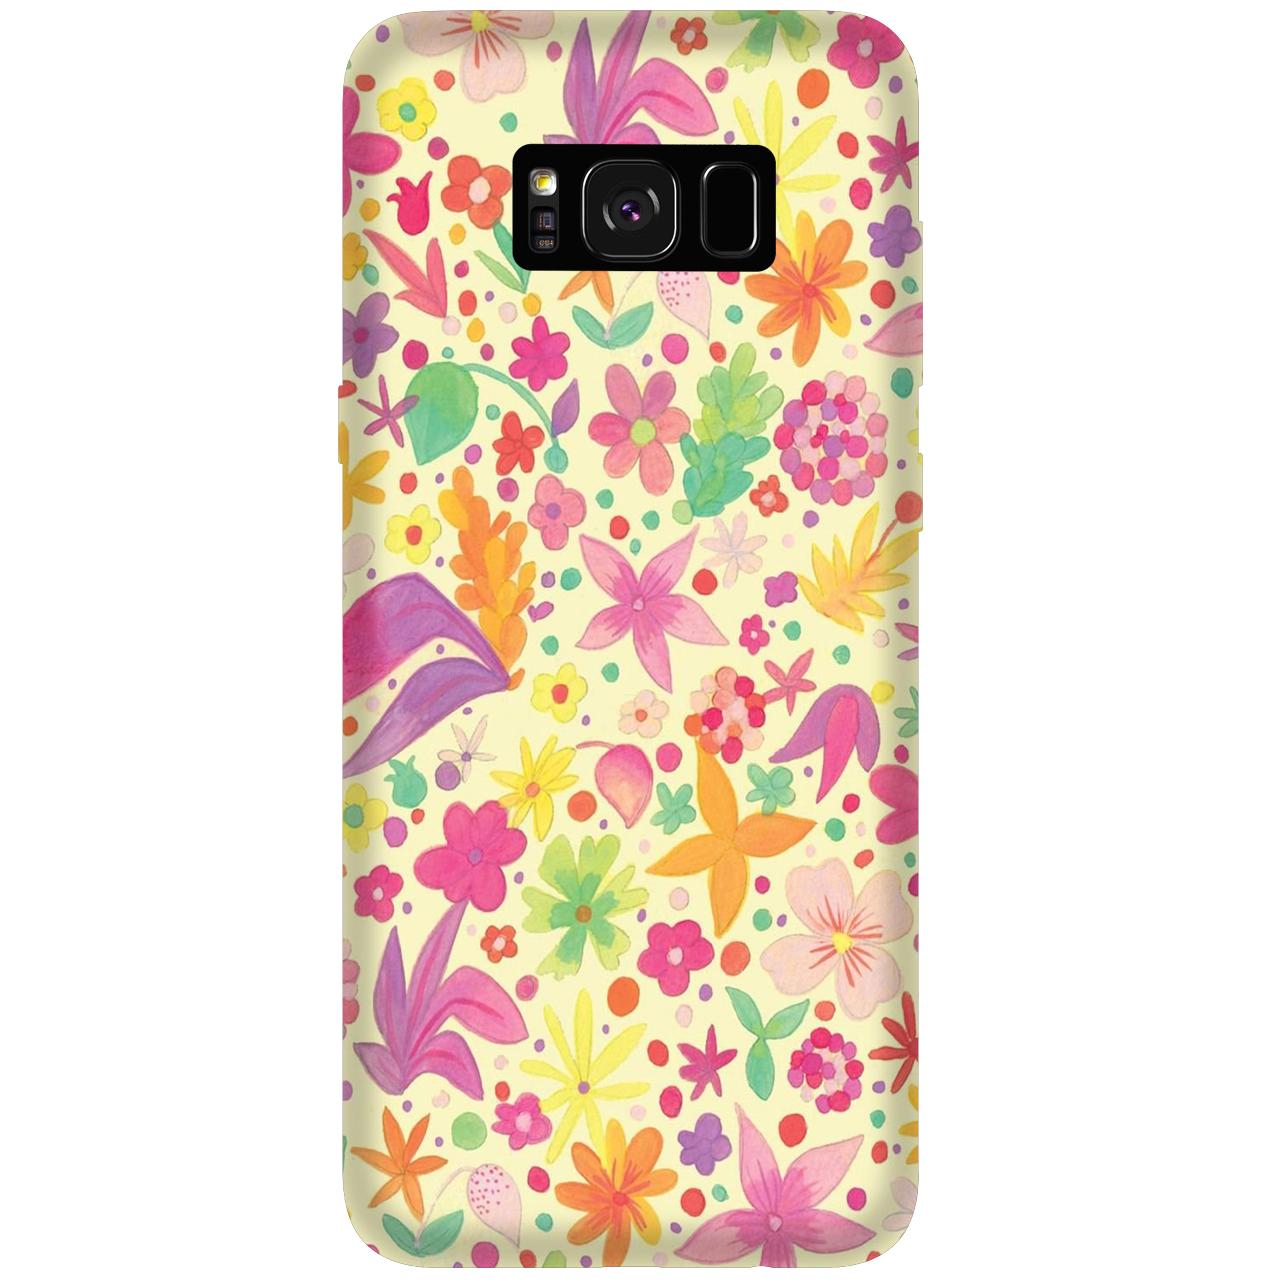 کاور  آکو  موبایل مدل C177 FlowerPattern مناسب برای گوشی موبایل سامسونگ Galaxy S8